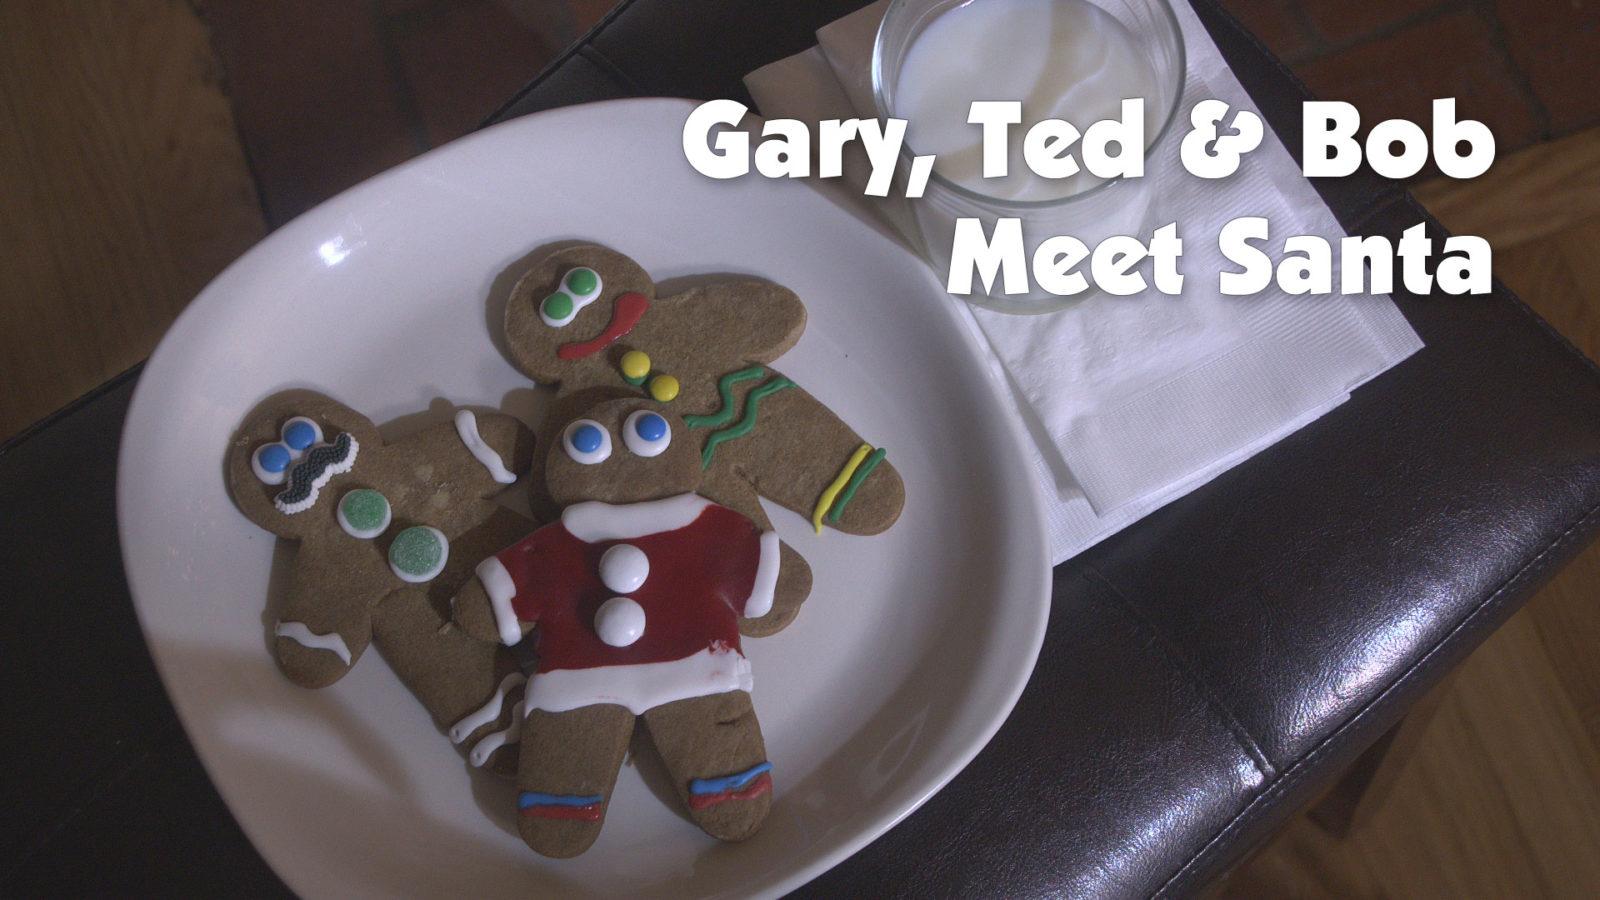 Gary, Ted & Bob Meet Santa